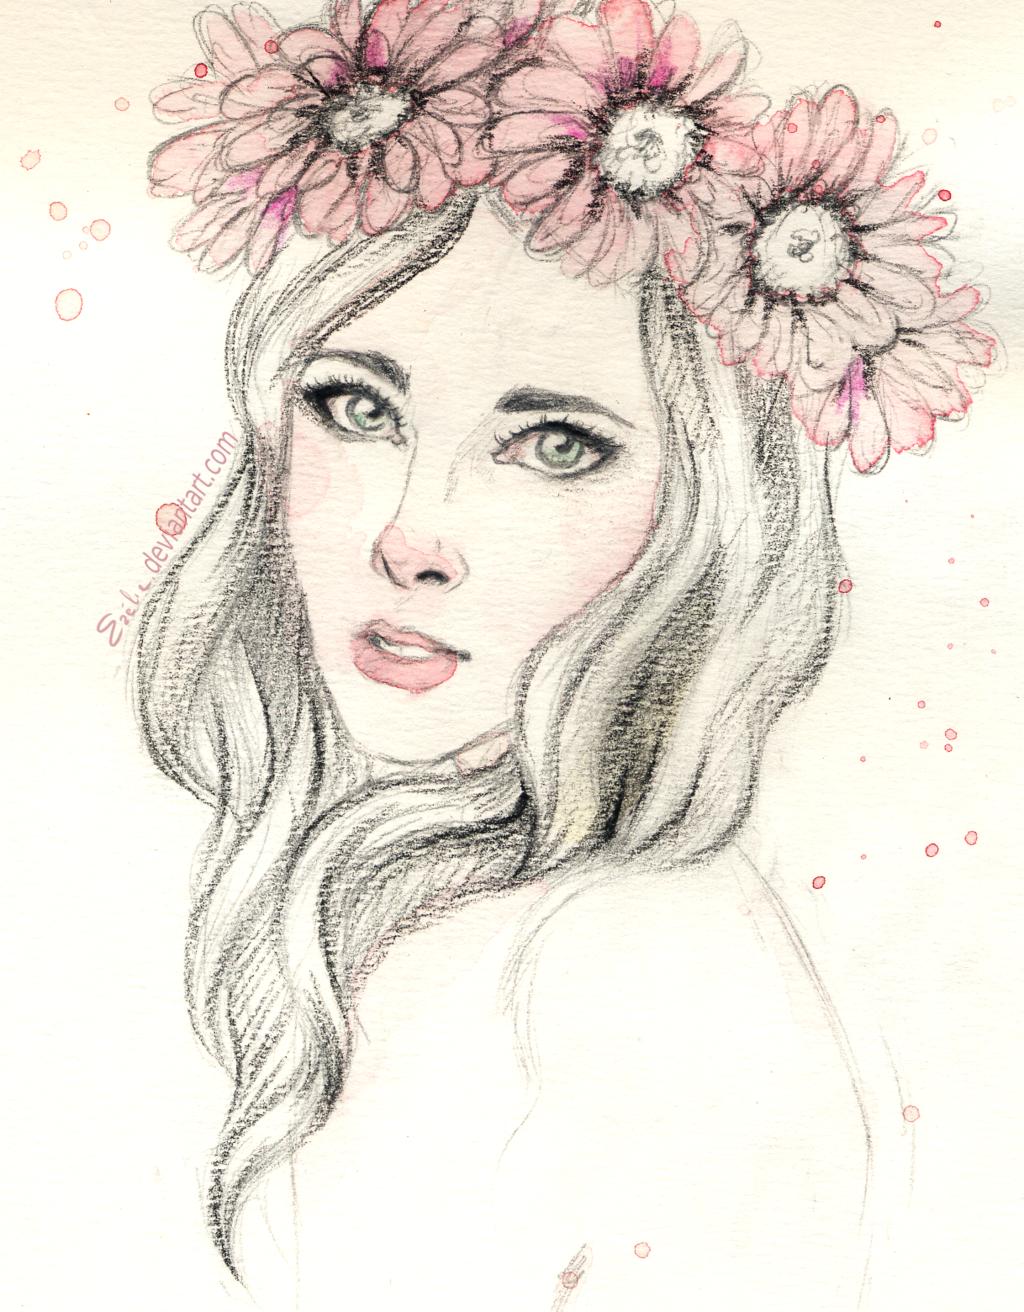 Drawn portrait floral By deviantart Ezelie is flowers